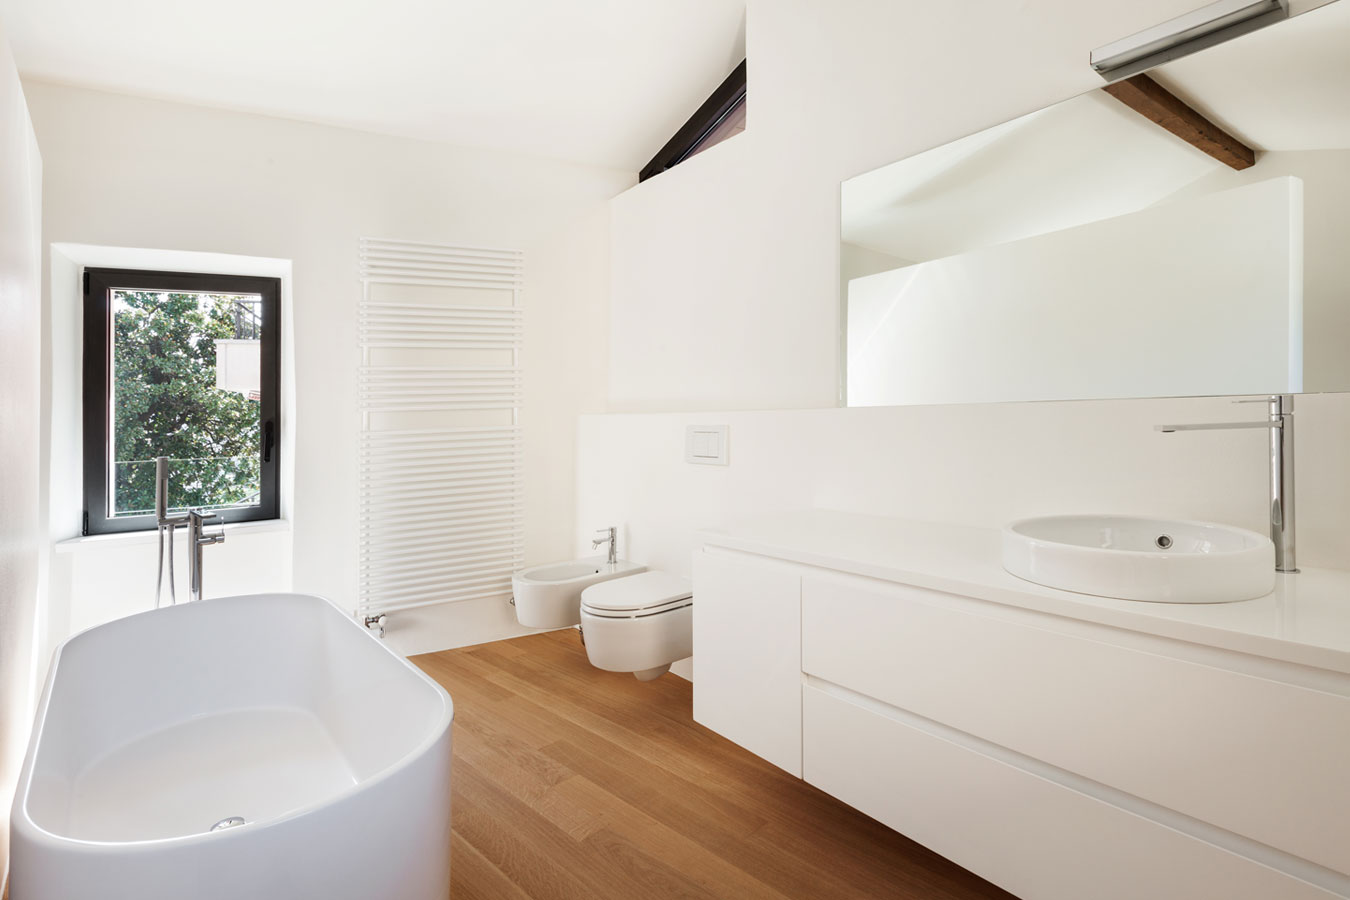 Welke Materialen Badkamer : Materiaal badkamer plafond badkamerie klussen